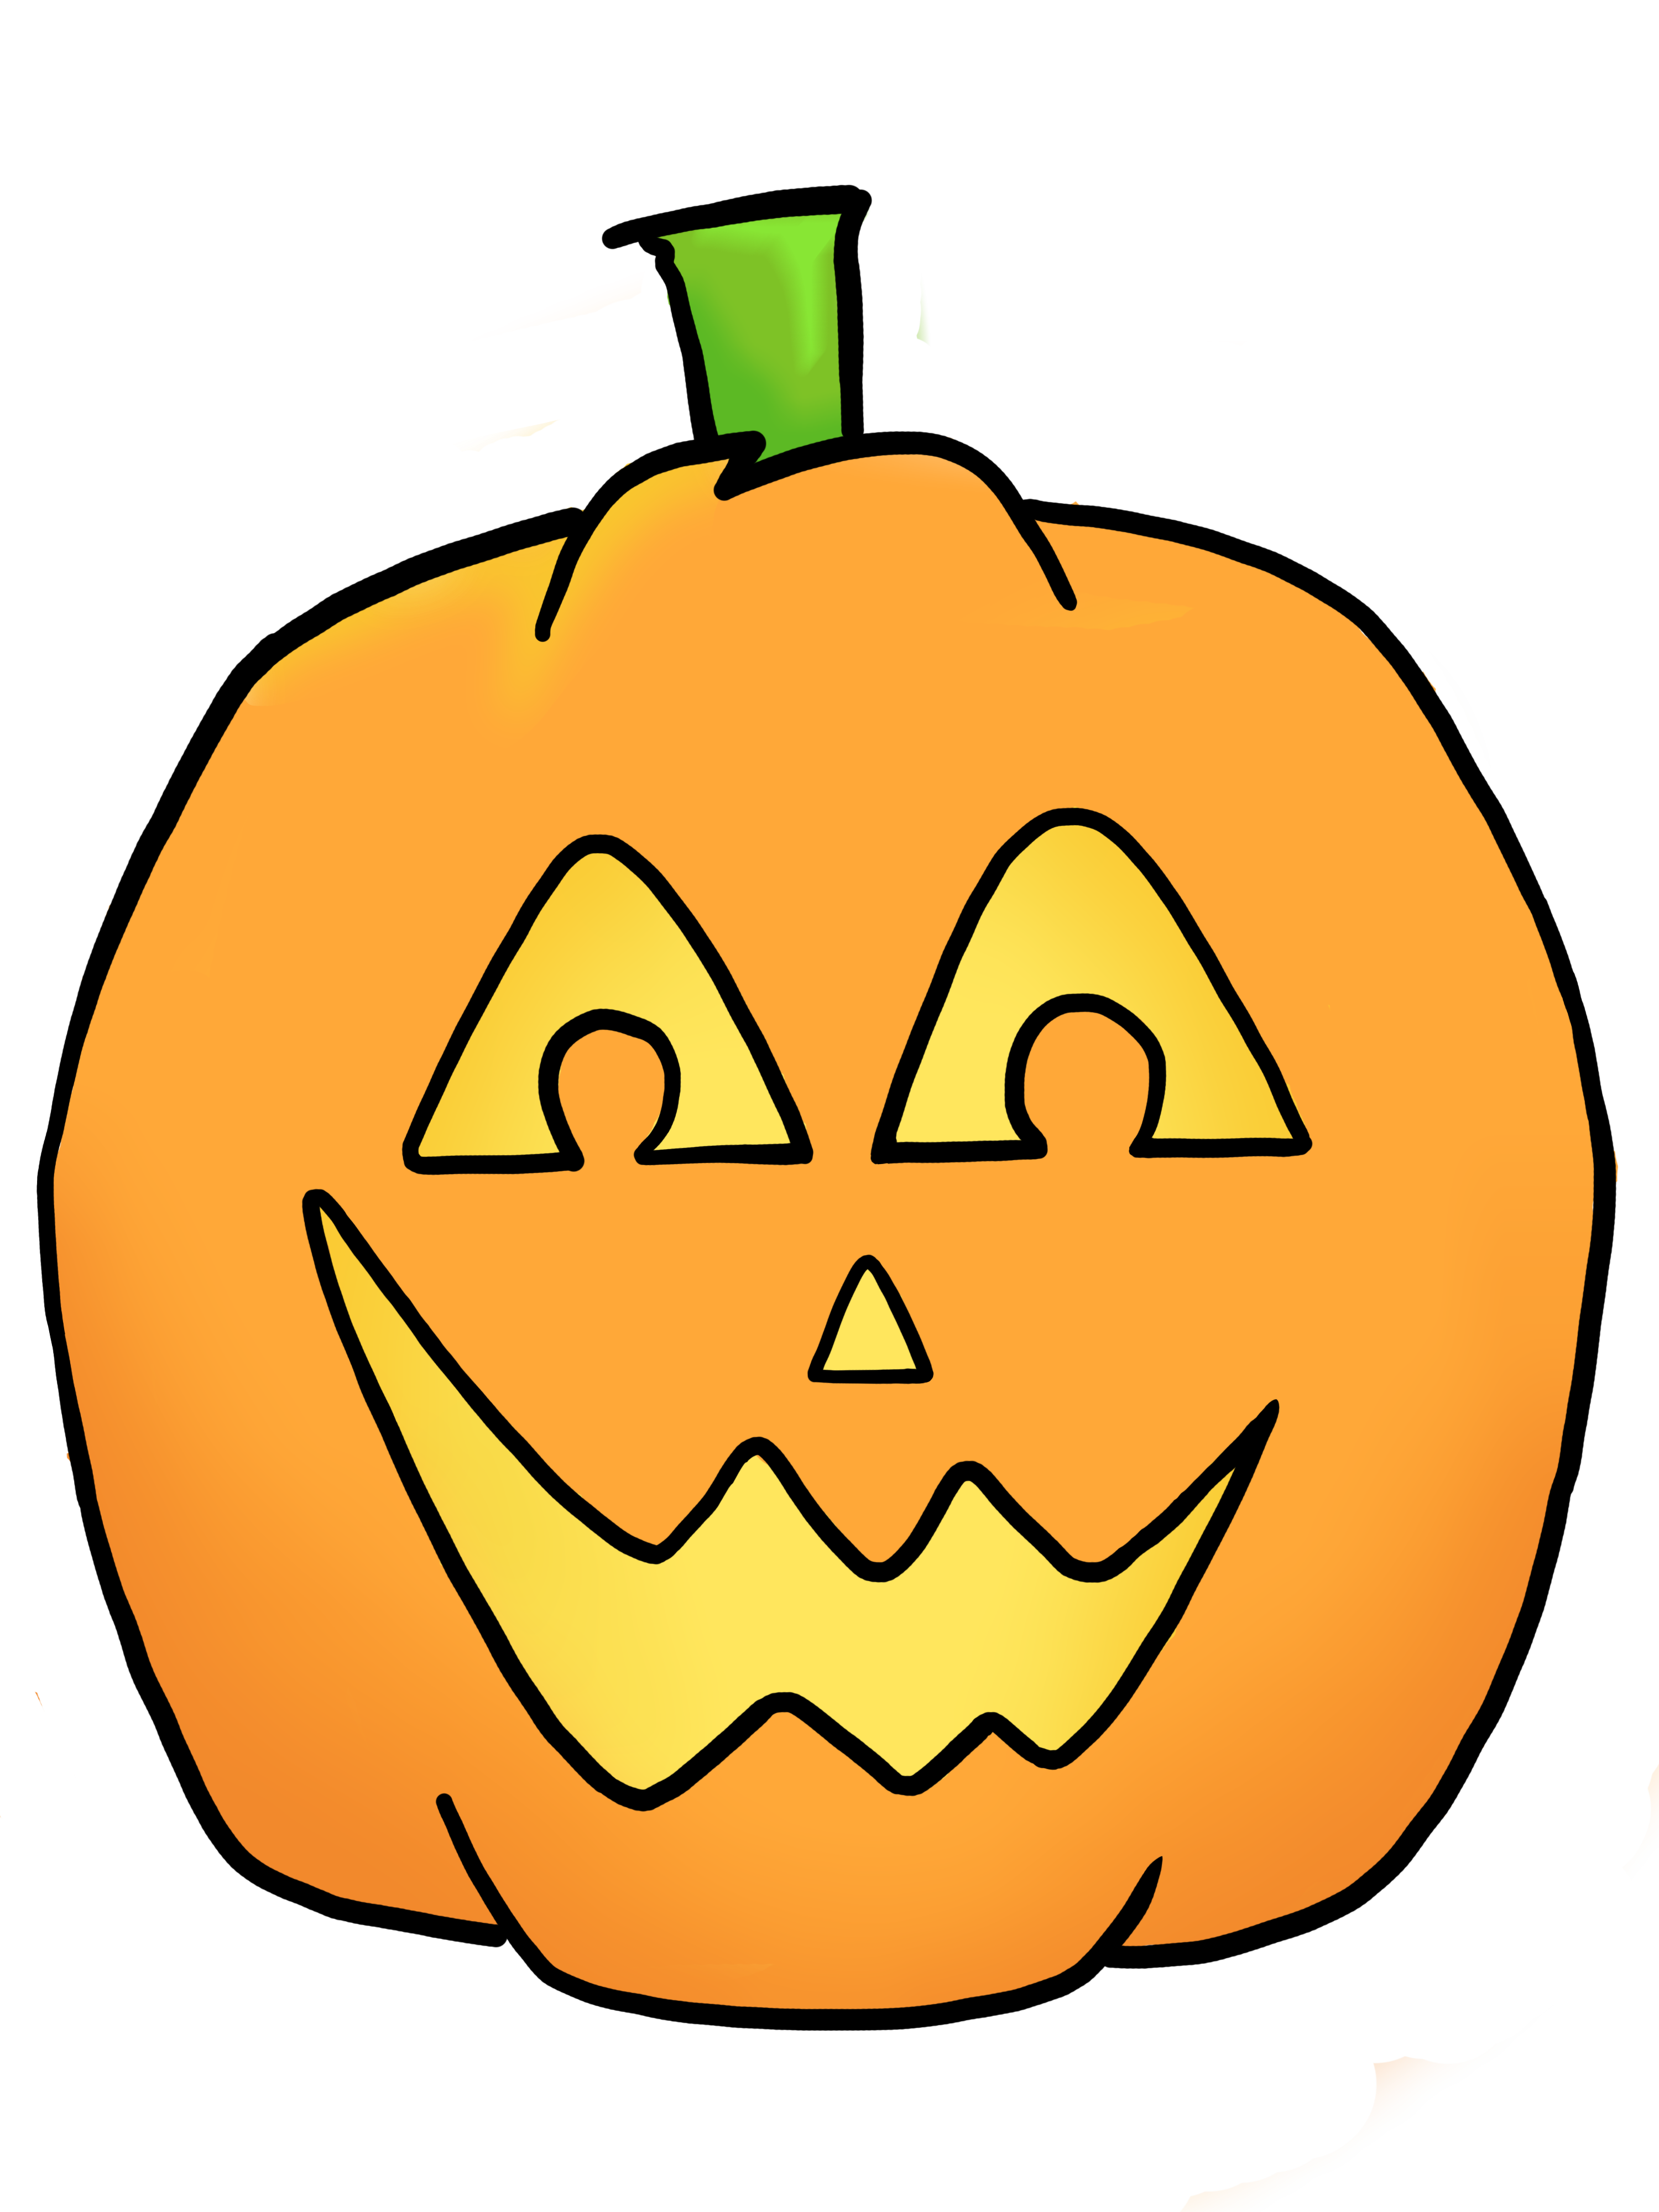 pumpkin face clipart at getdrawings com free for personal use rh getdrawings com Painted Pumpkin Faces Cute Halloween Pumpkin Clip Art